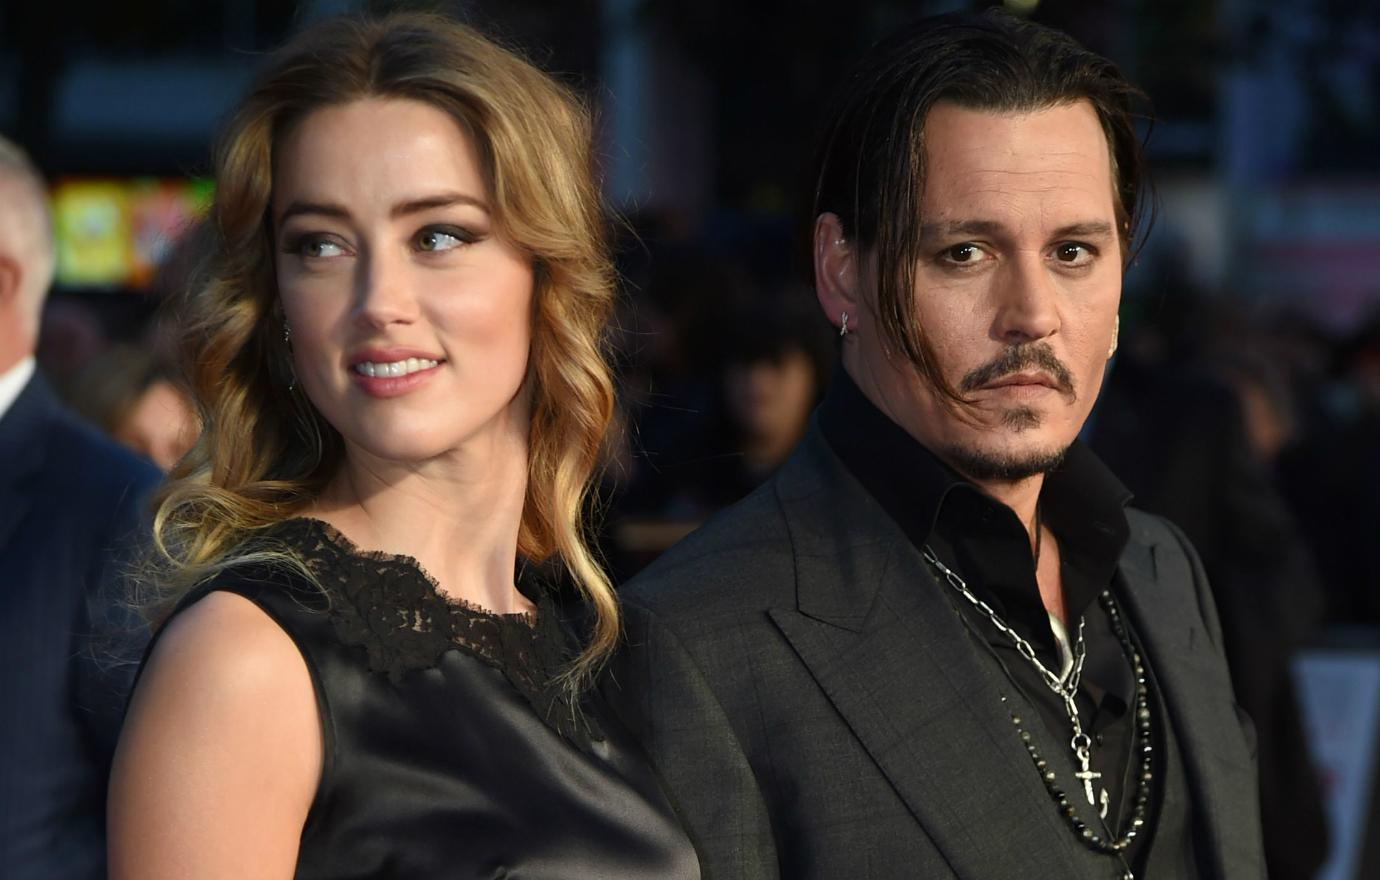 History amber heard dating Amber Heard